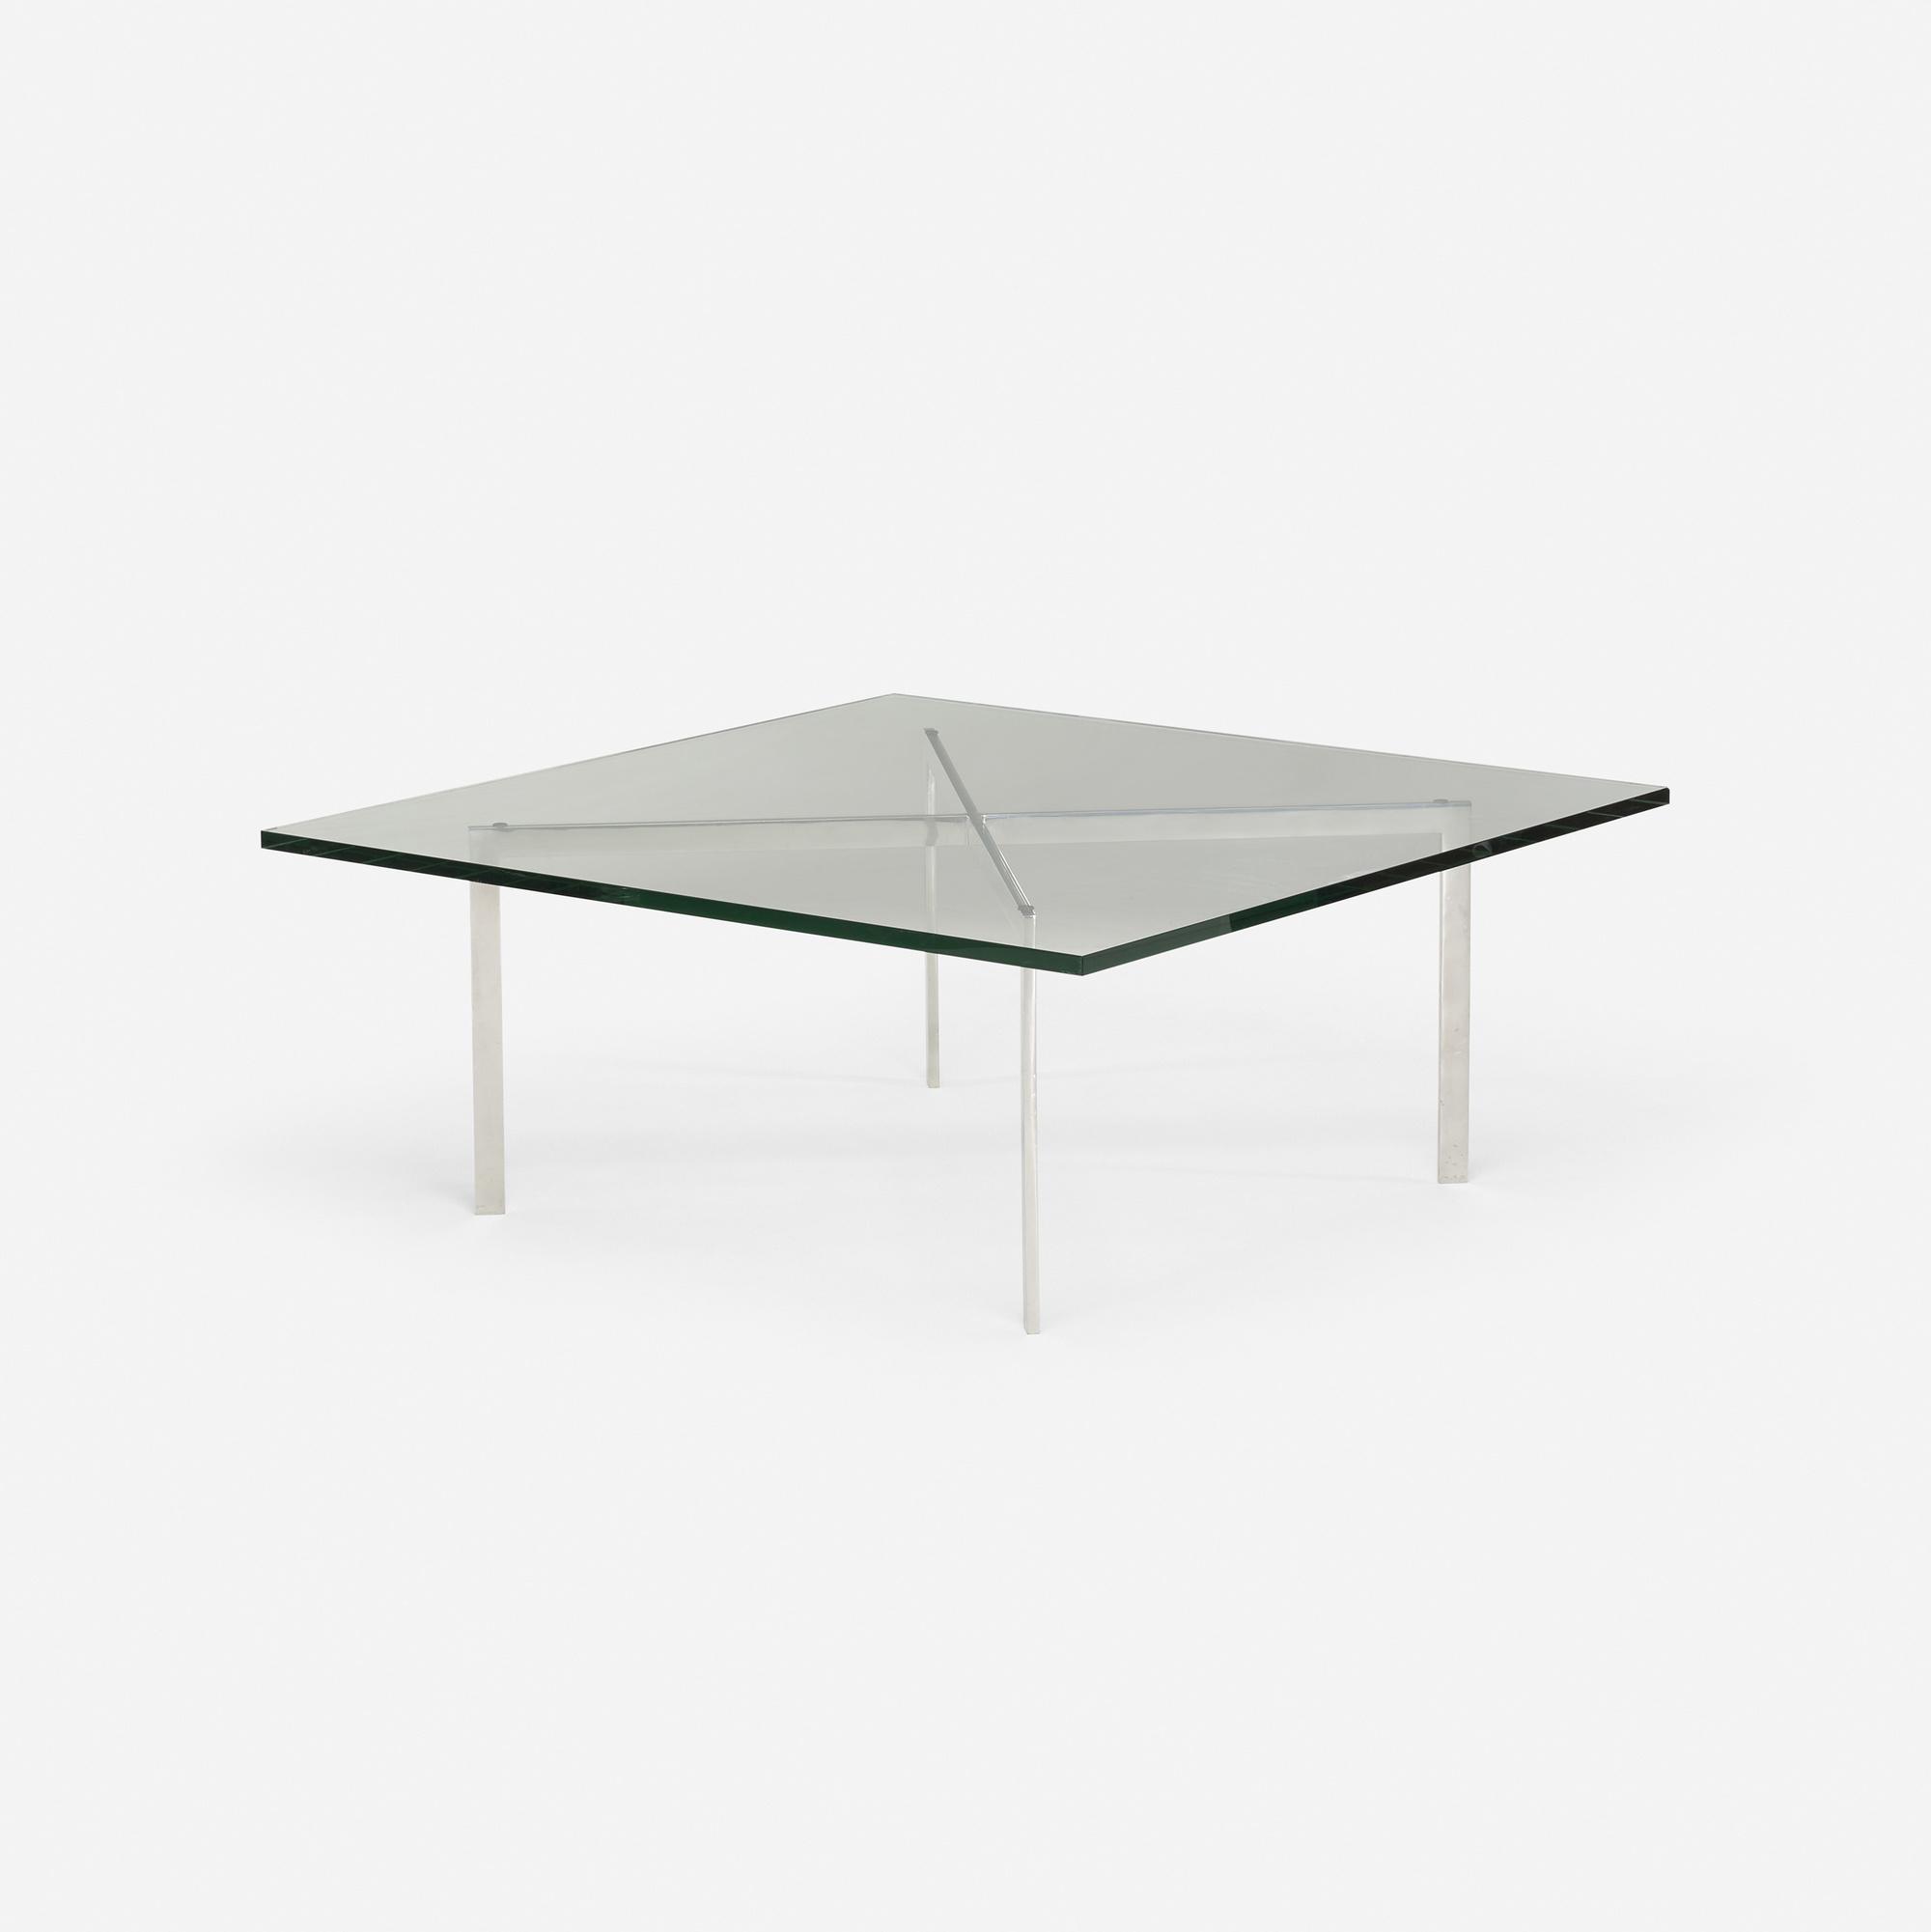 451: Ludwig Mies Van Der Rohe / Barcelona Coffee Table (1 Of 2)